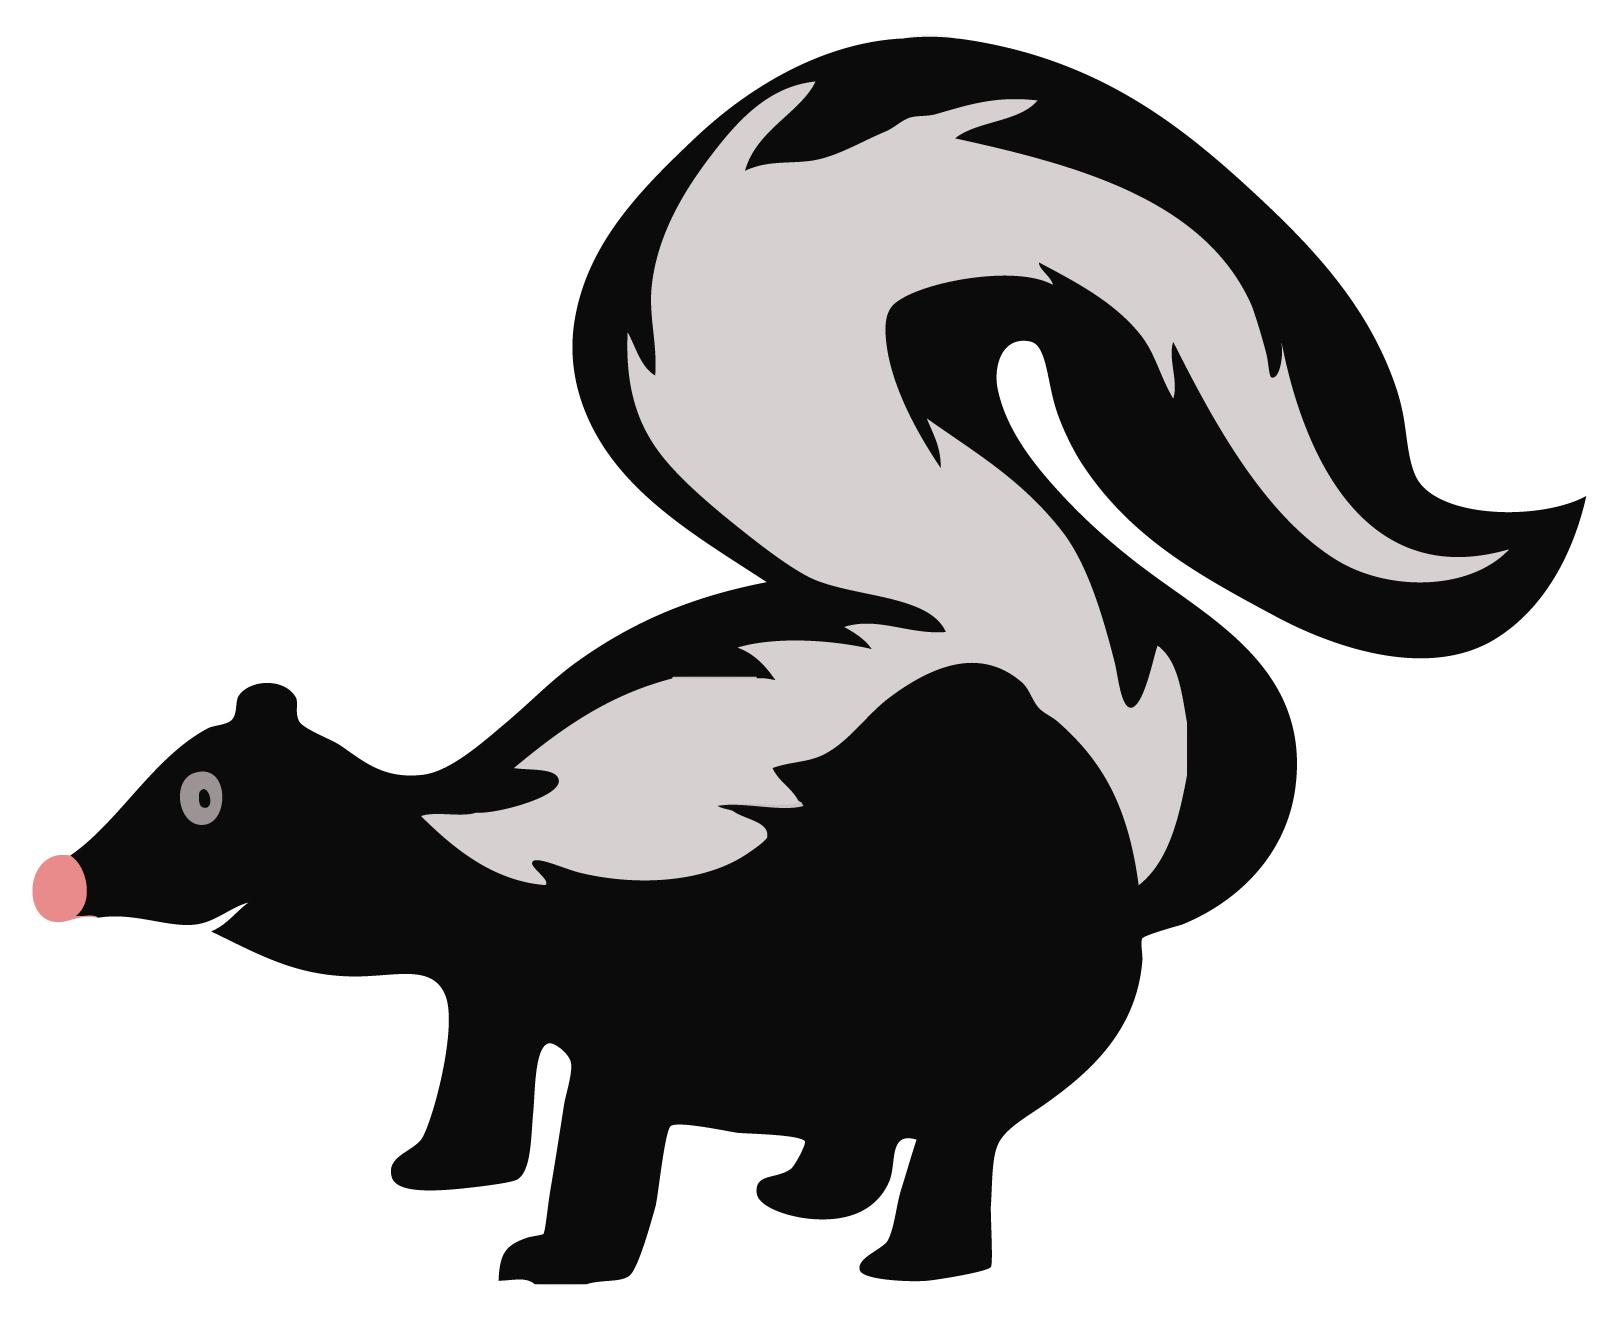 Free Skunk Cliparts, Download Free Clip Art, Free Clip Art.